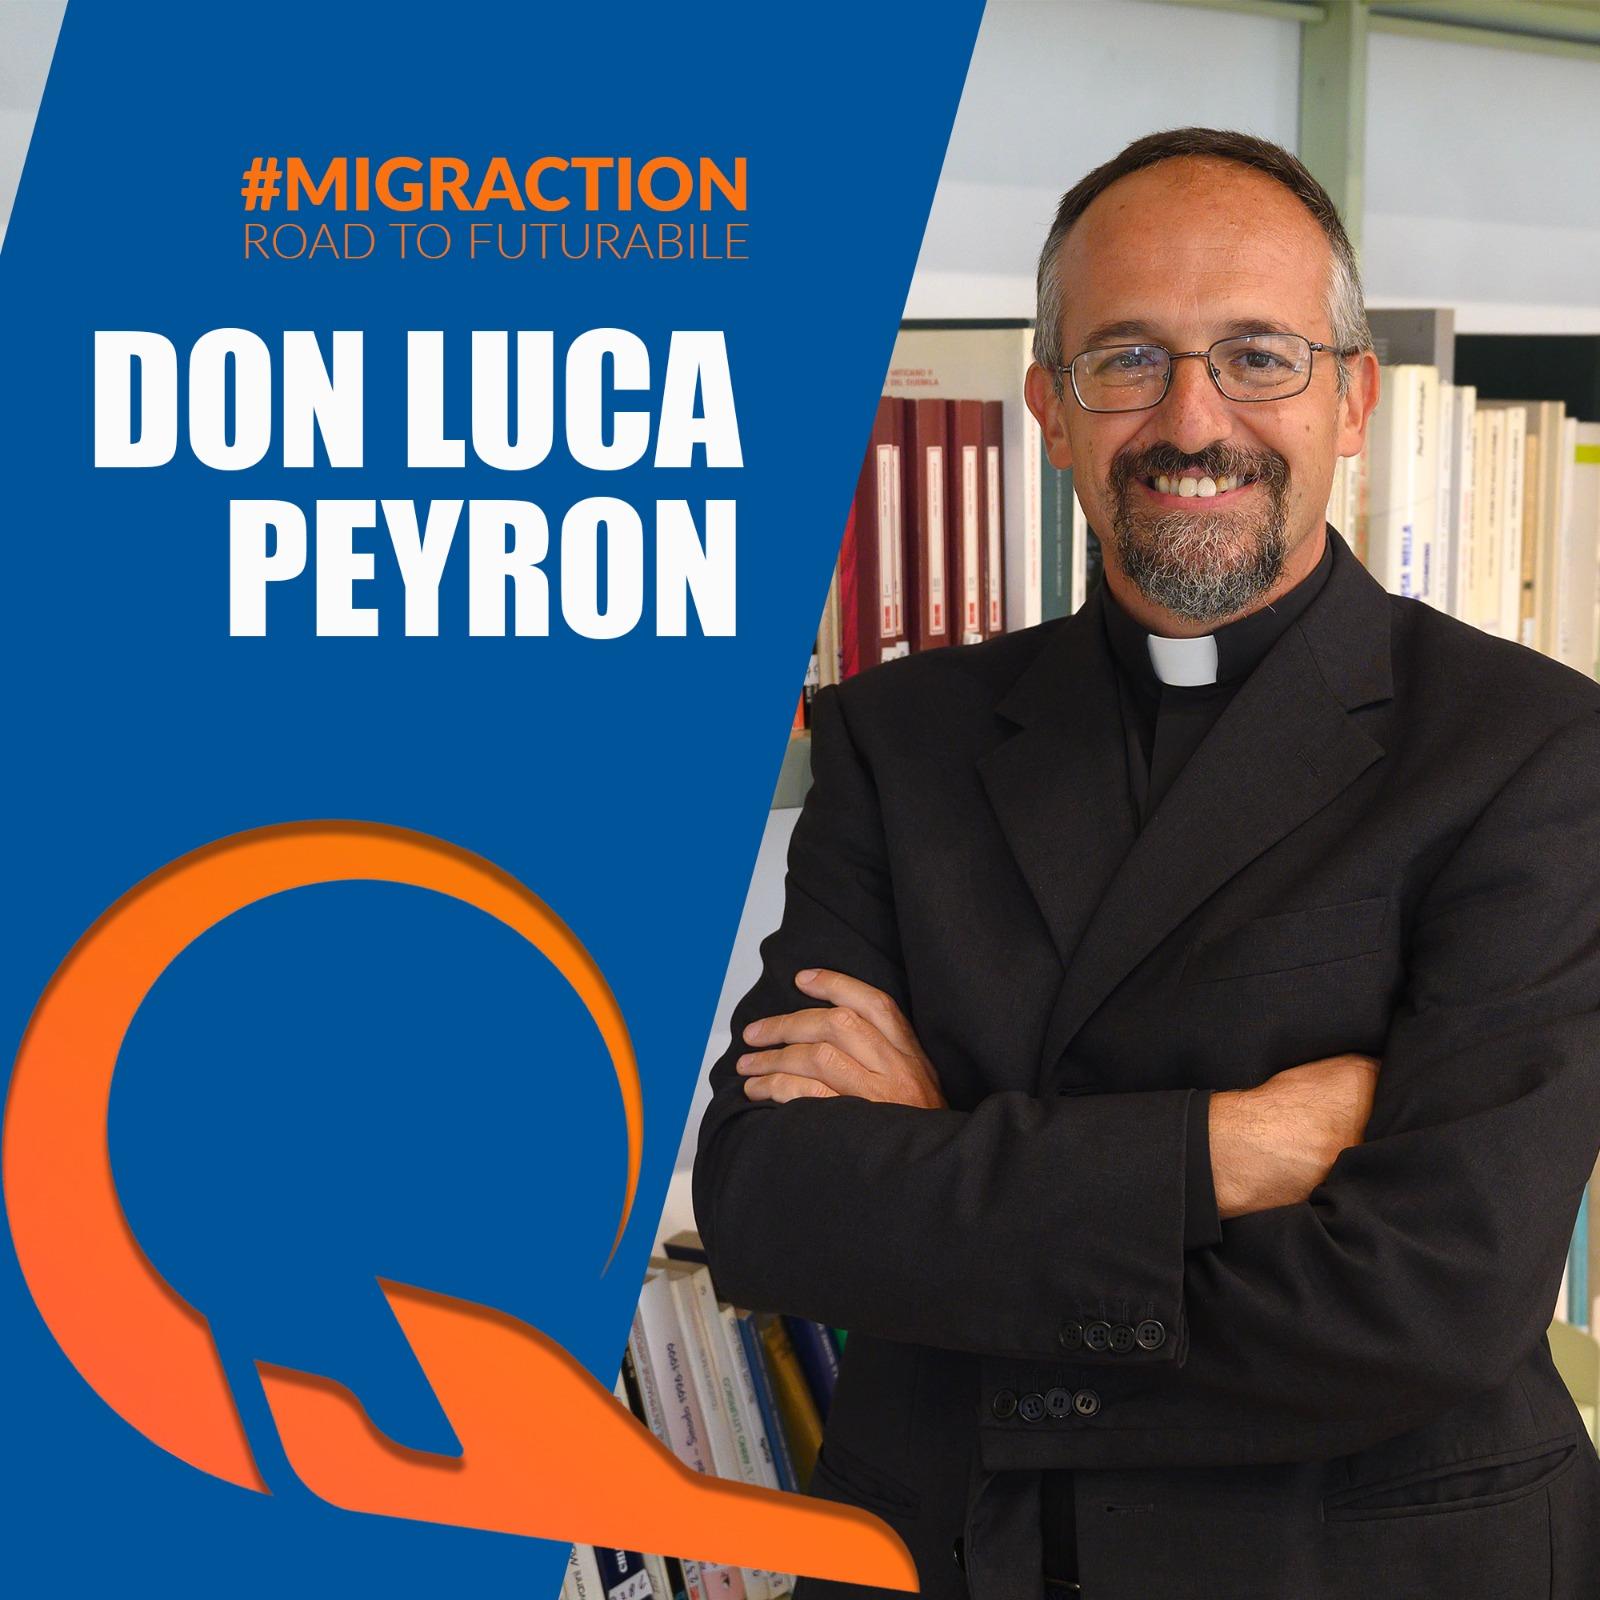 Don Luca Peyron